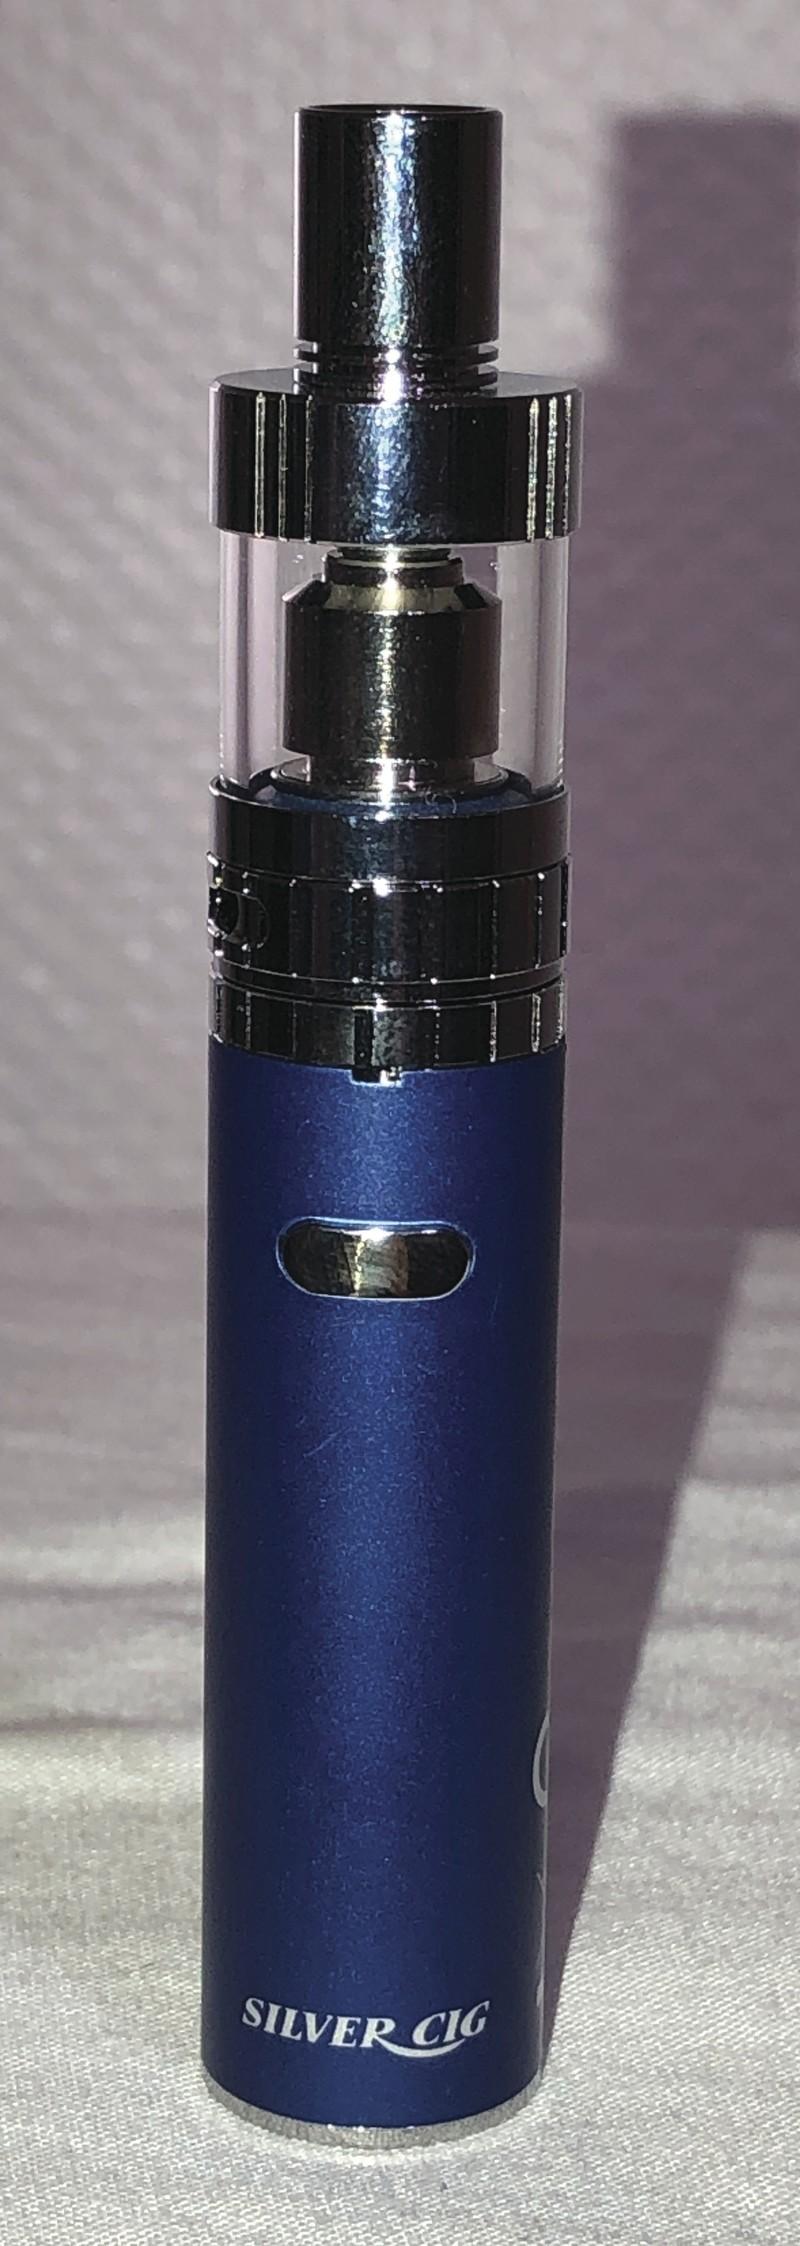 E cigarette E SHADE Bleue  - Le Brazza NANCY - Voir en grand